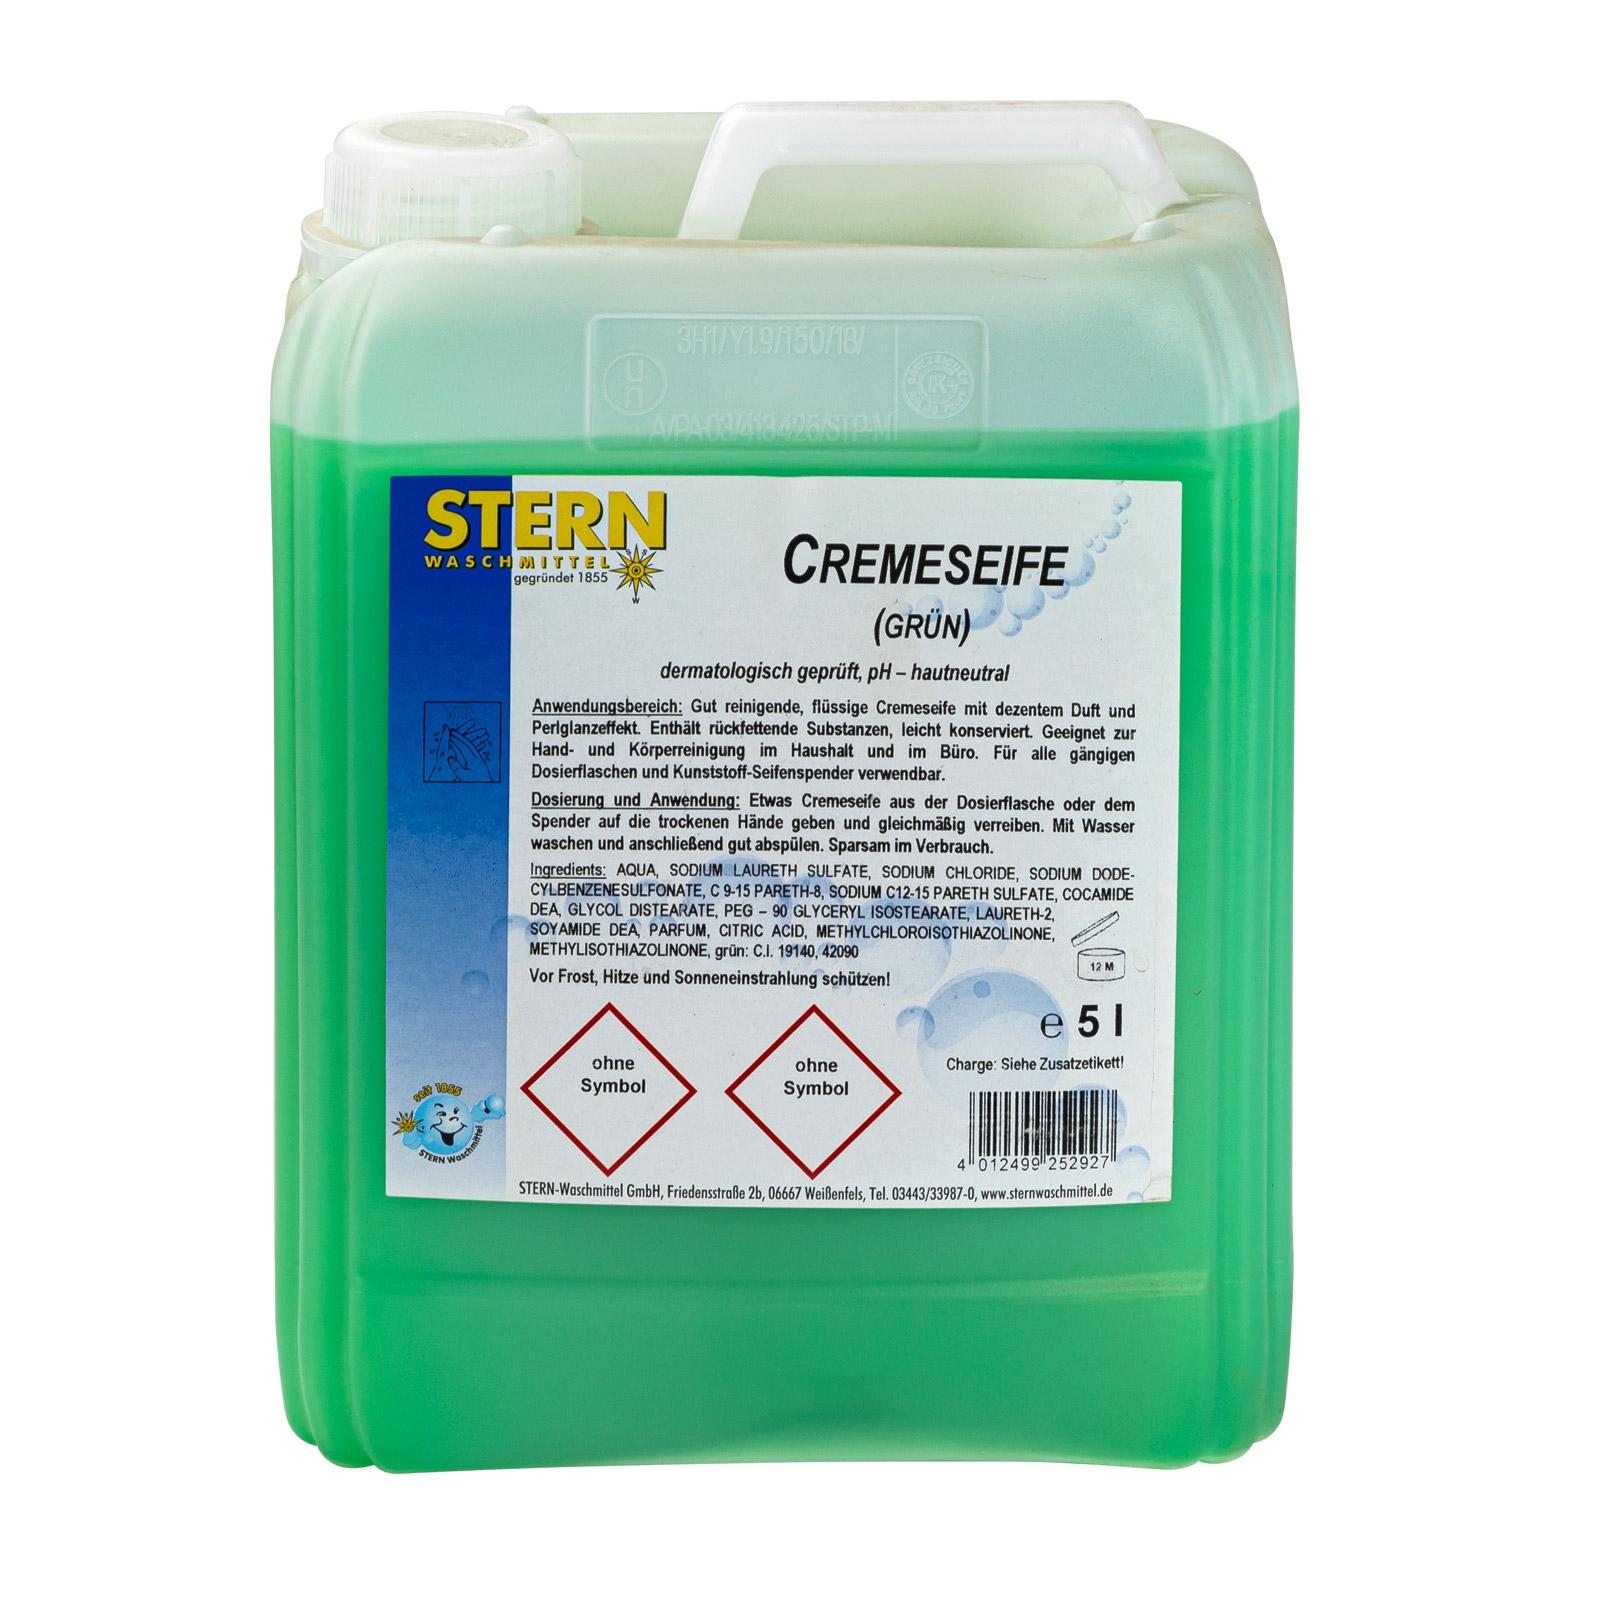 Dema Stabilo Cremeseife 5 Liter Kanister (Grün) Handseife Handreinigung 21087